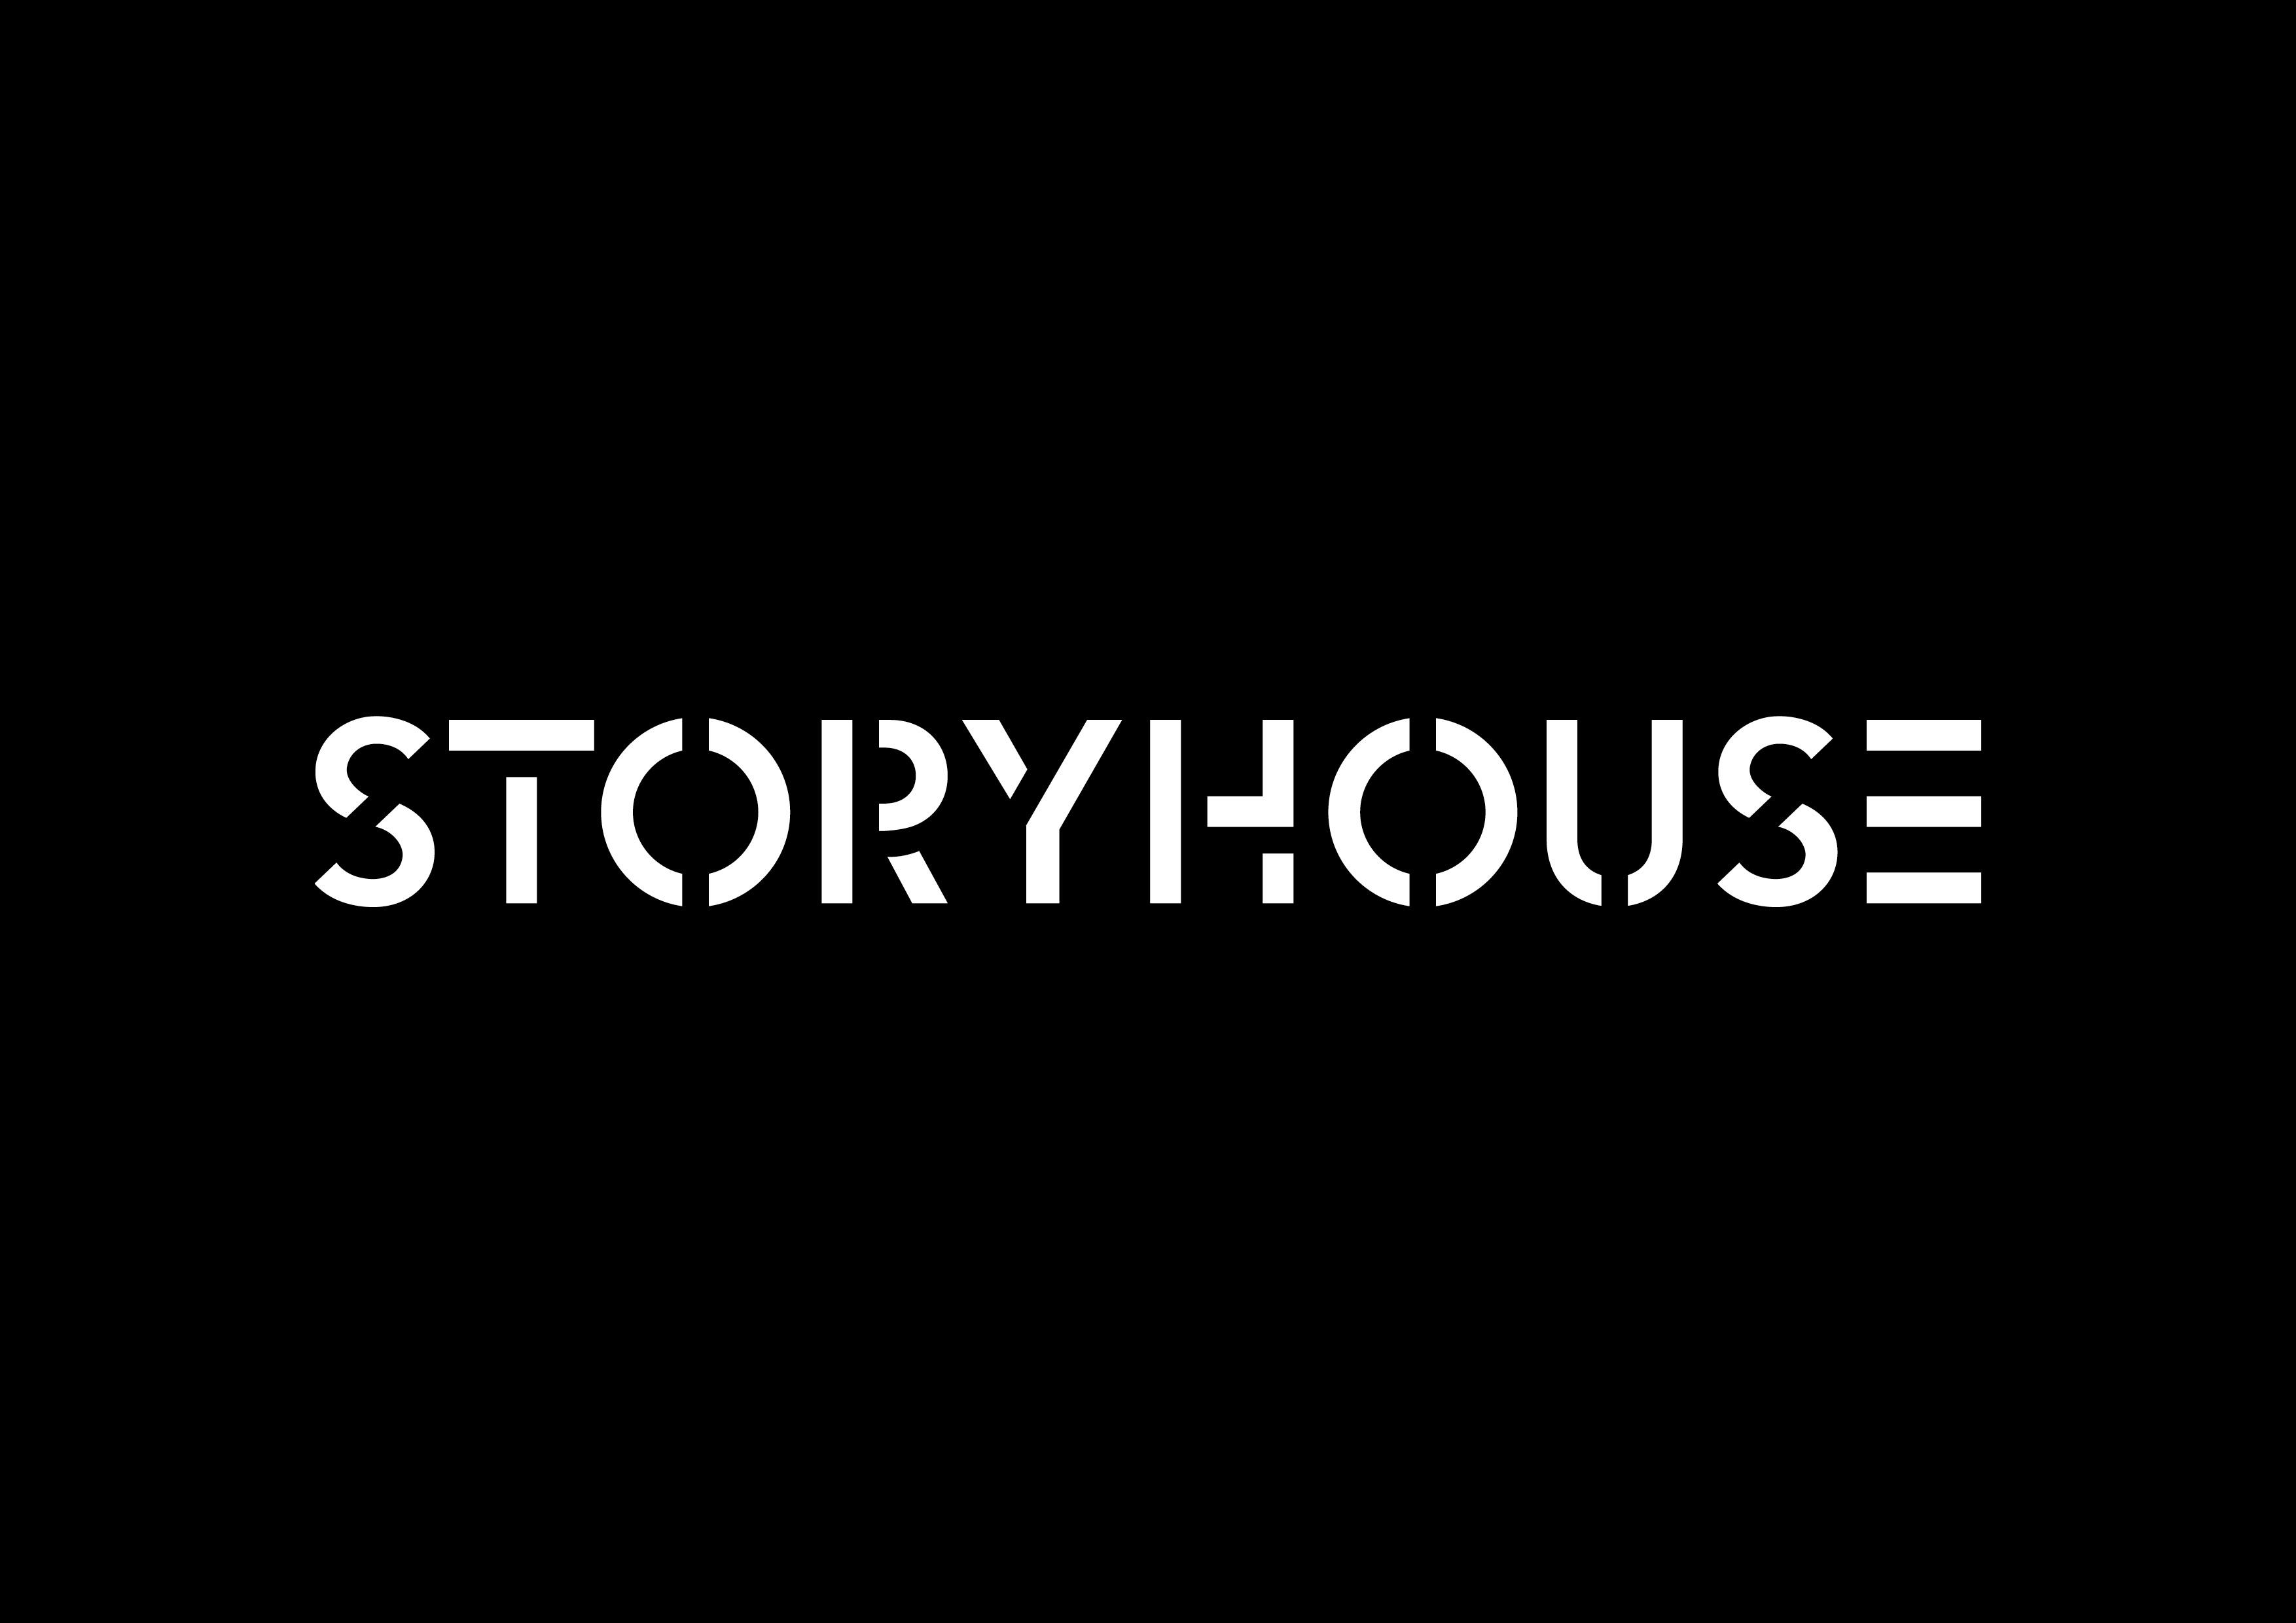 Storyhouse_1